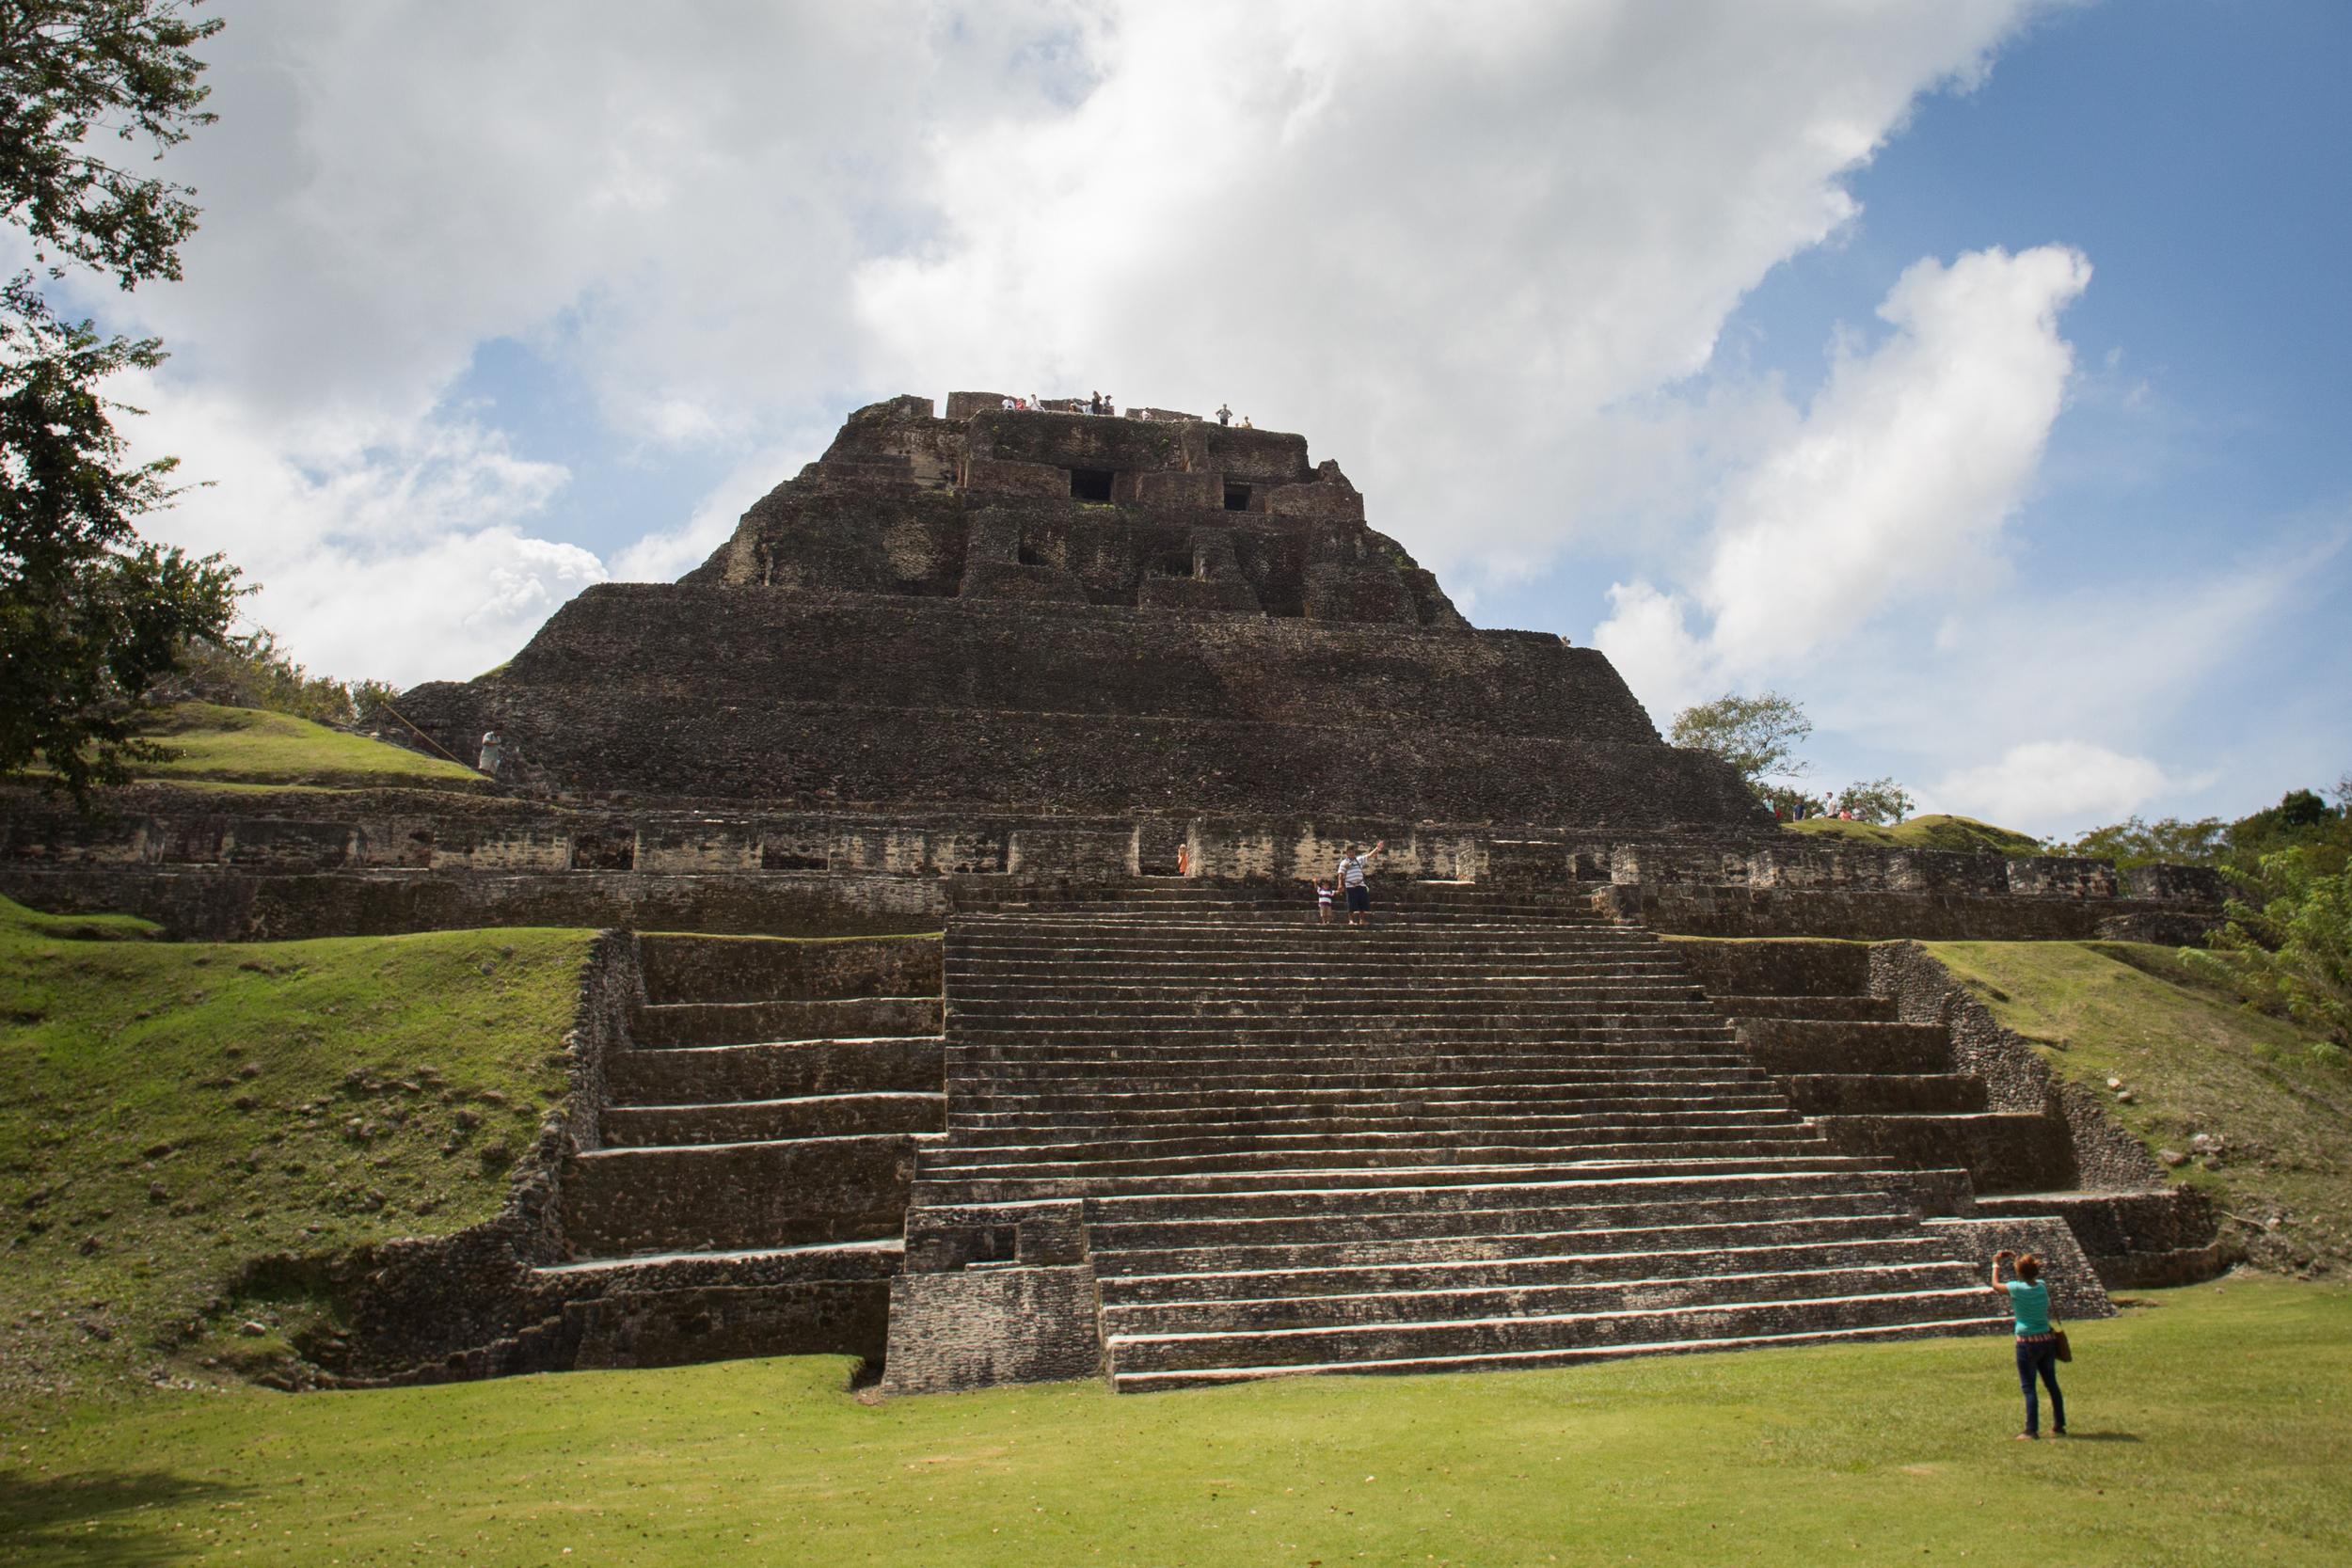 Xunantunich: El Castillo from the North side